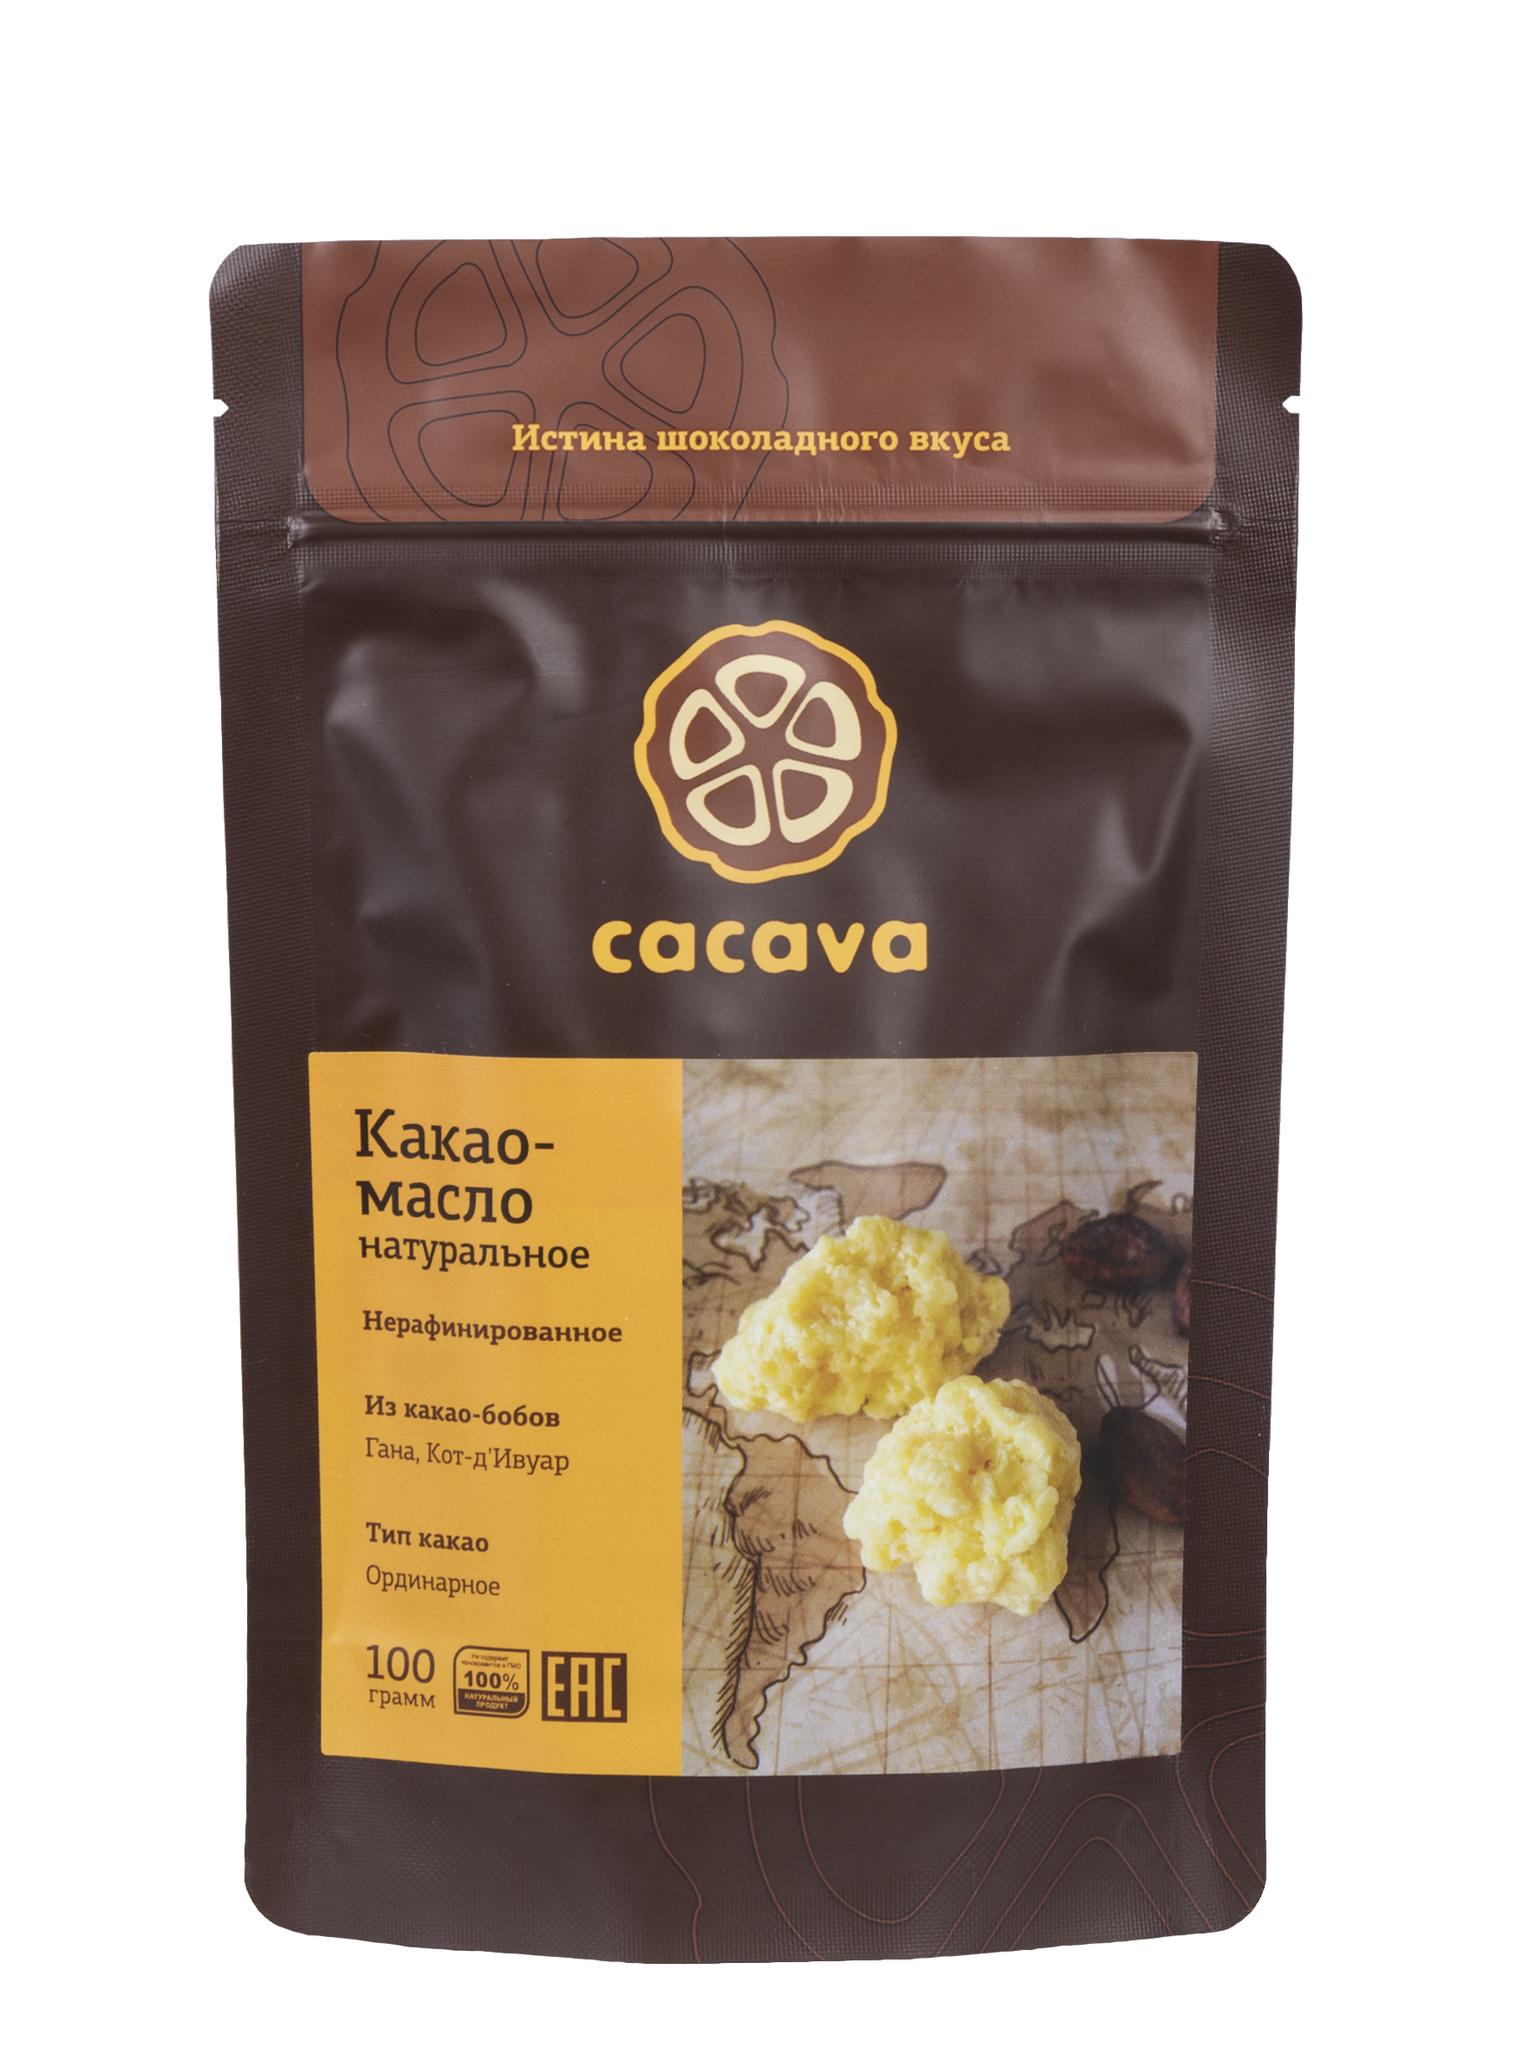 Какао-масло натуральное (Африка), упаковка 100 грамм